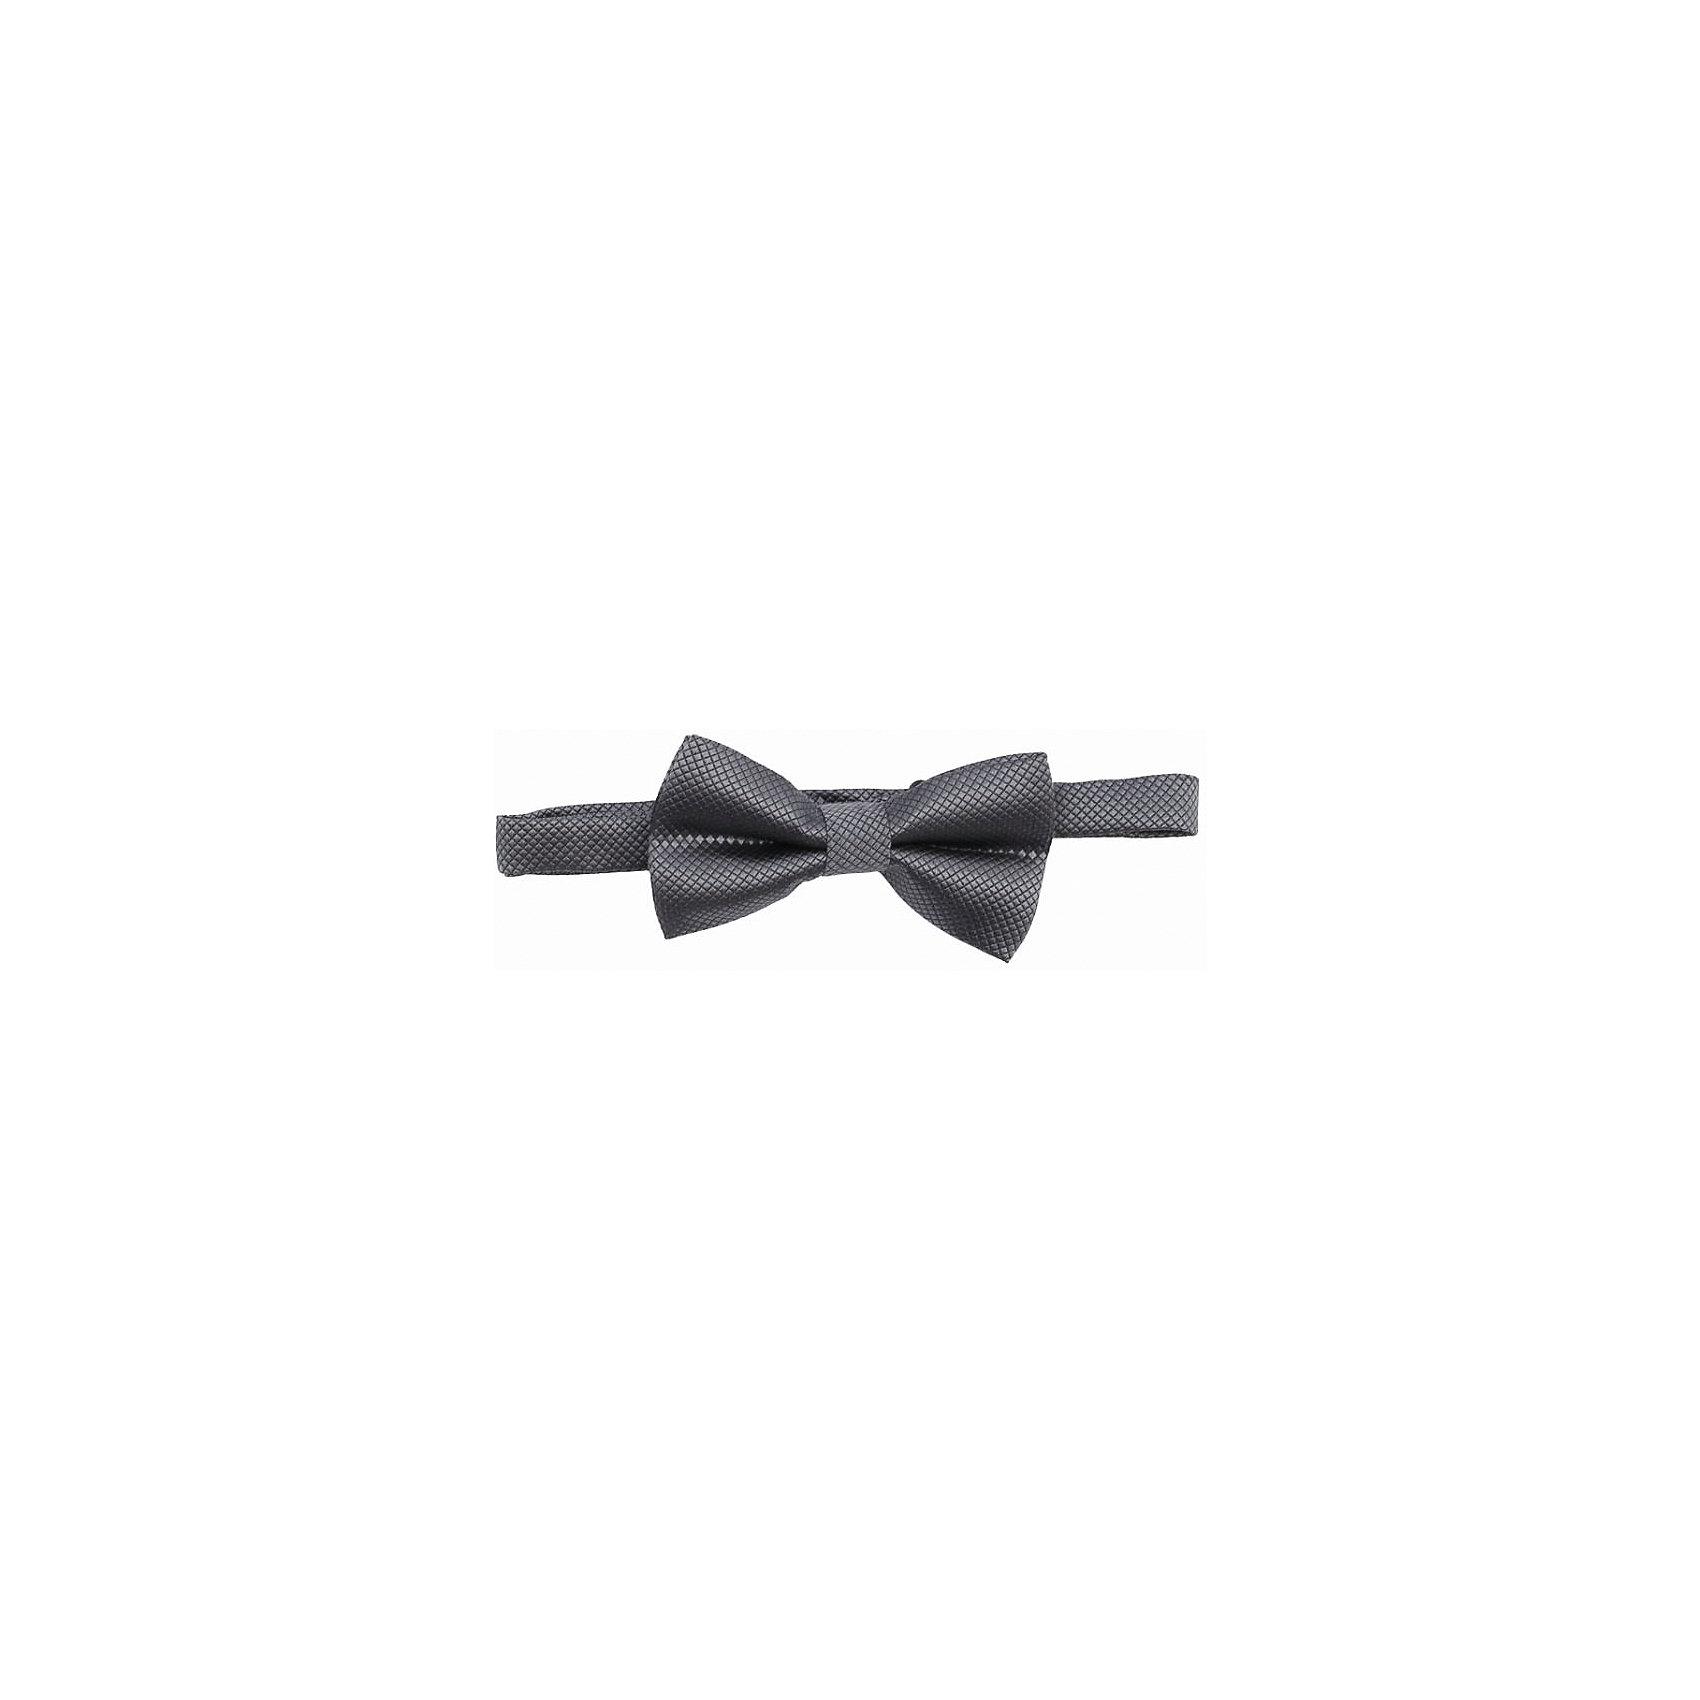 S'cool Галстук-бабочка для мальчика S'cool starkman галстук бабочка 435 фуксия starkman